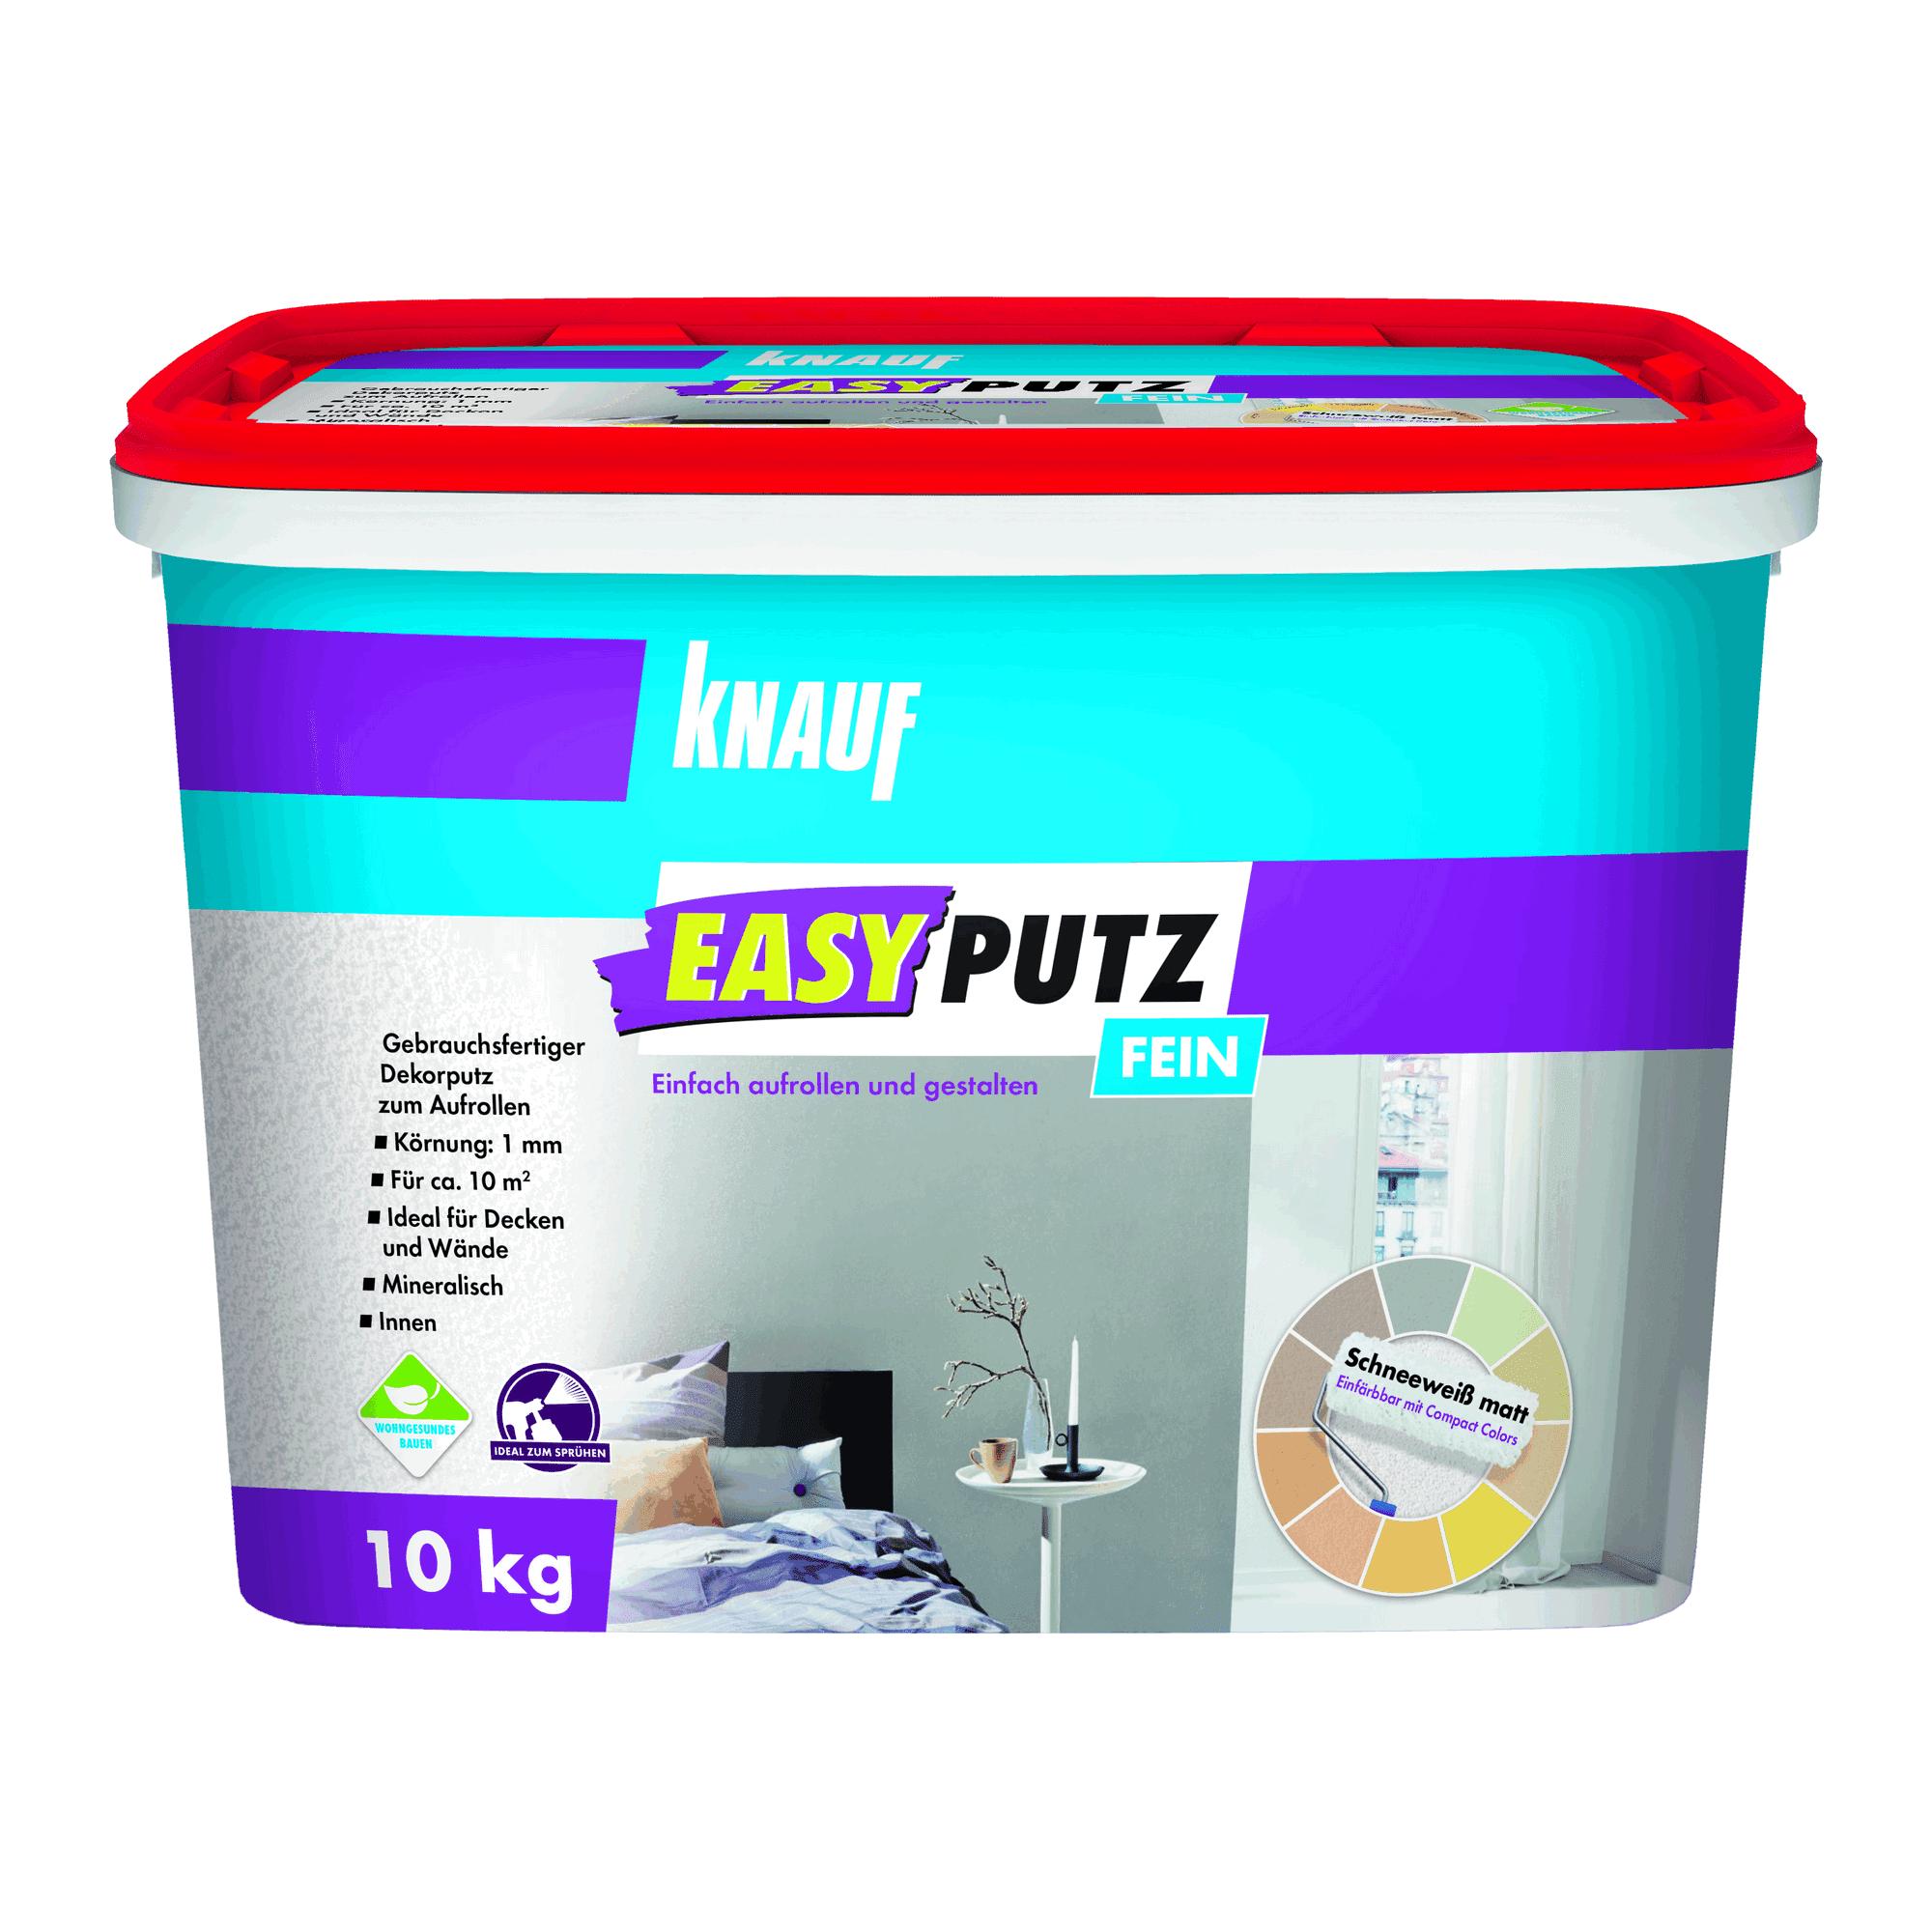 Favorit Knauf Easy Putz 1 mm ǀ toom Baumarkt ZJ39